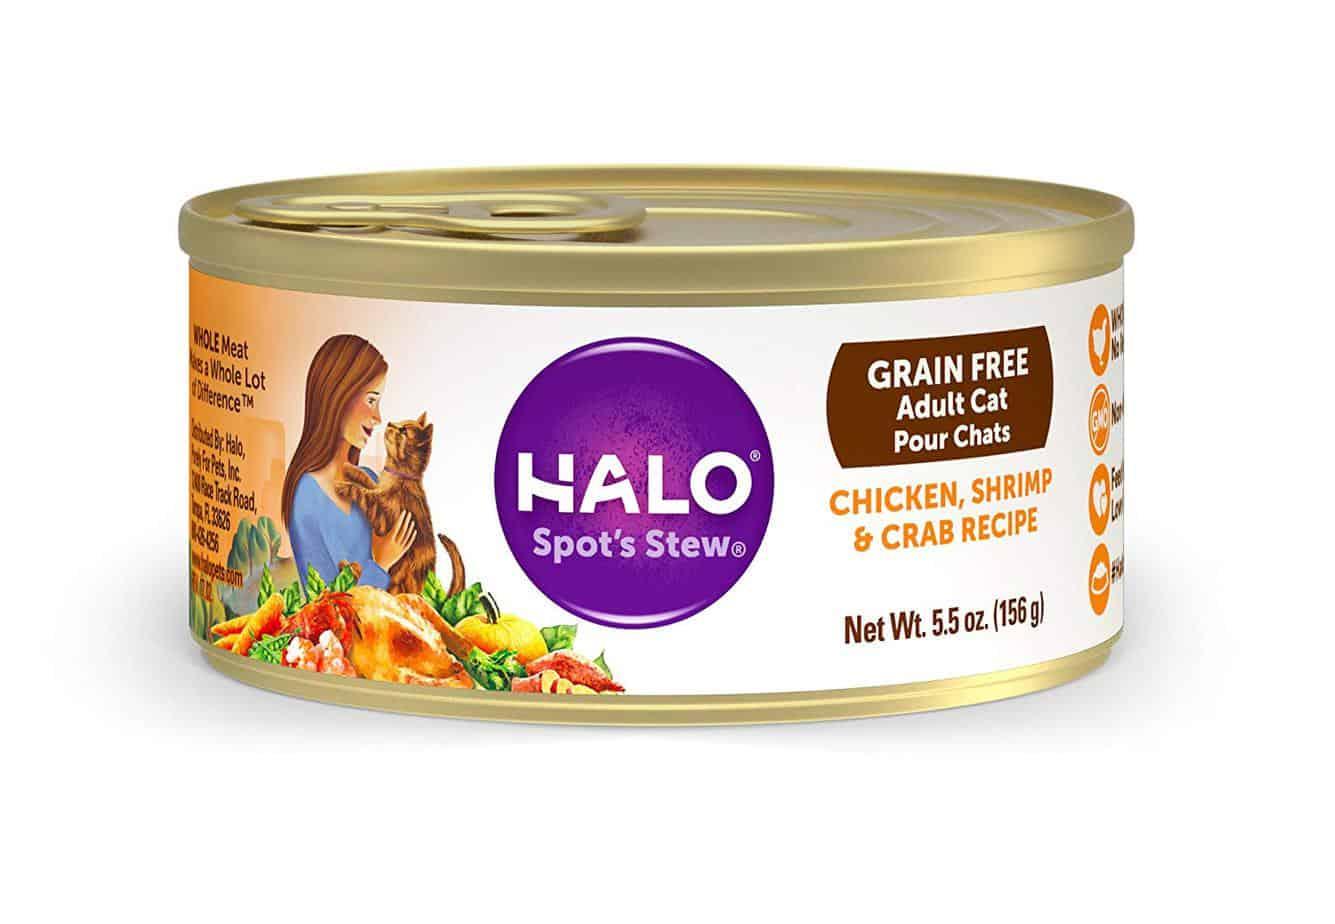 halo spot's stew